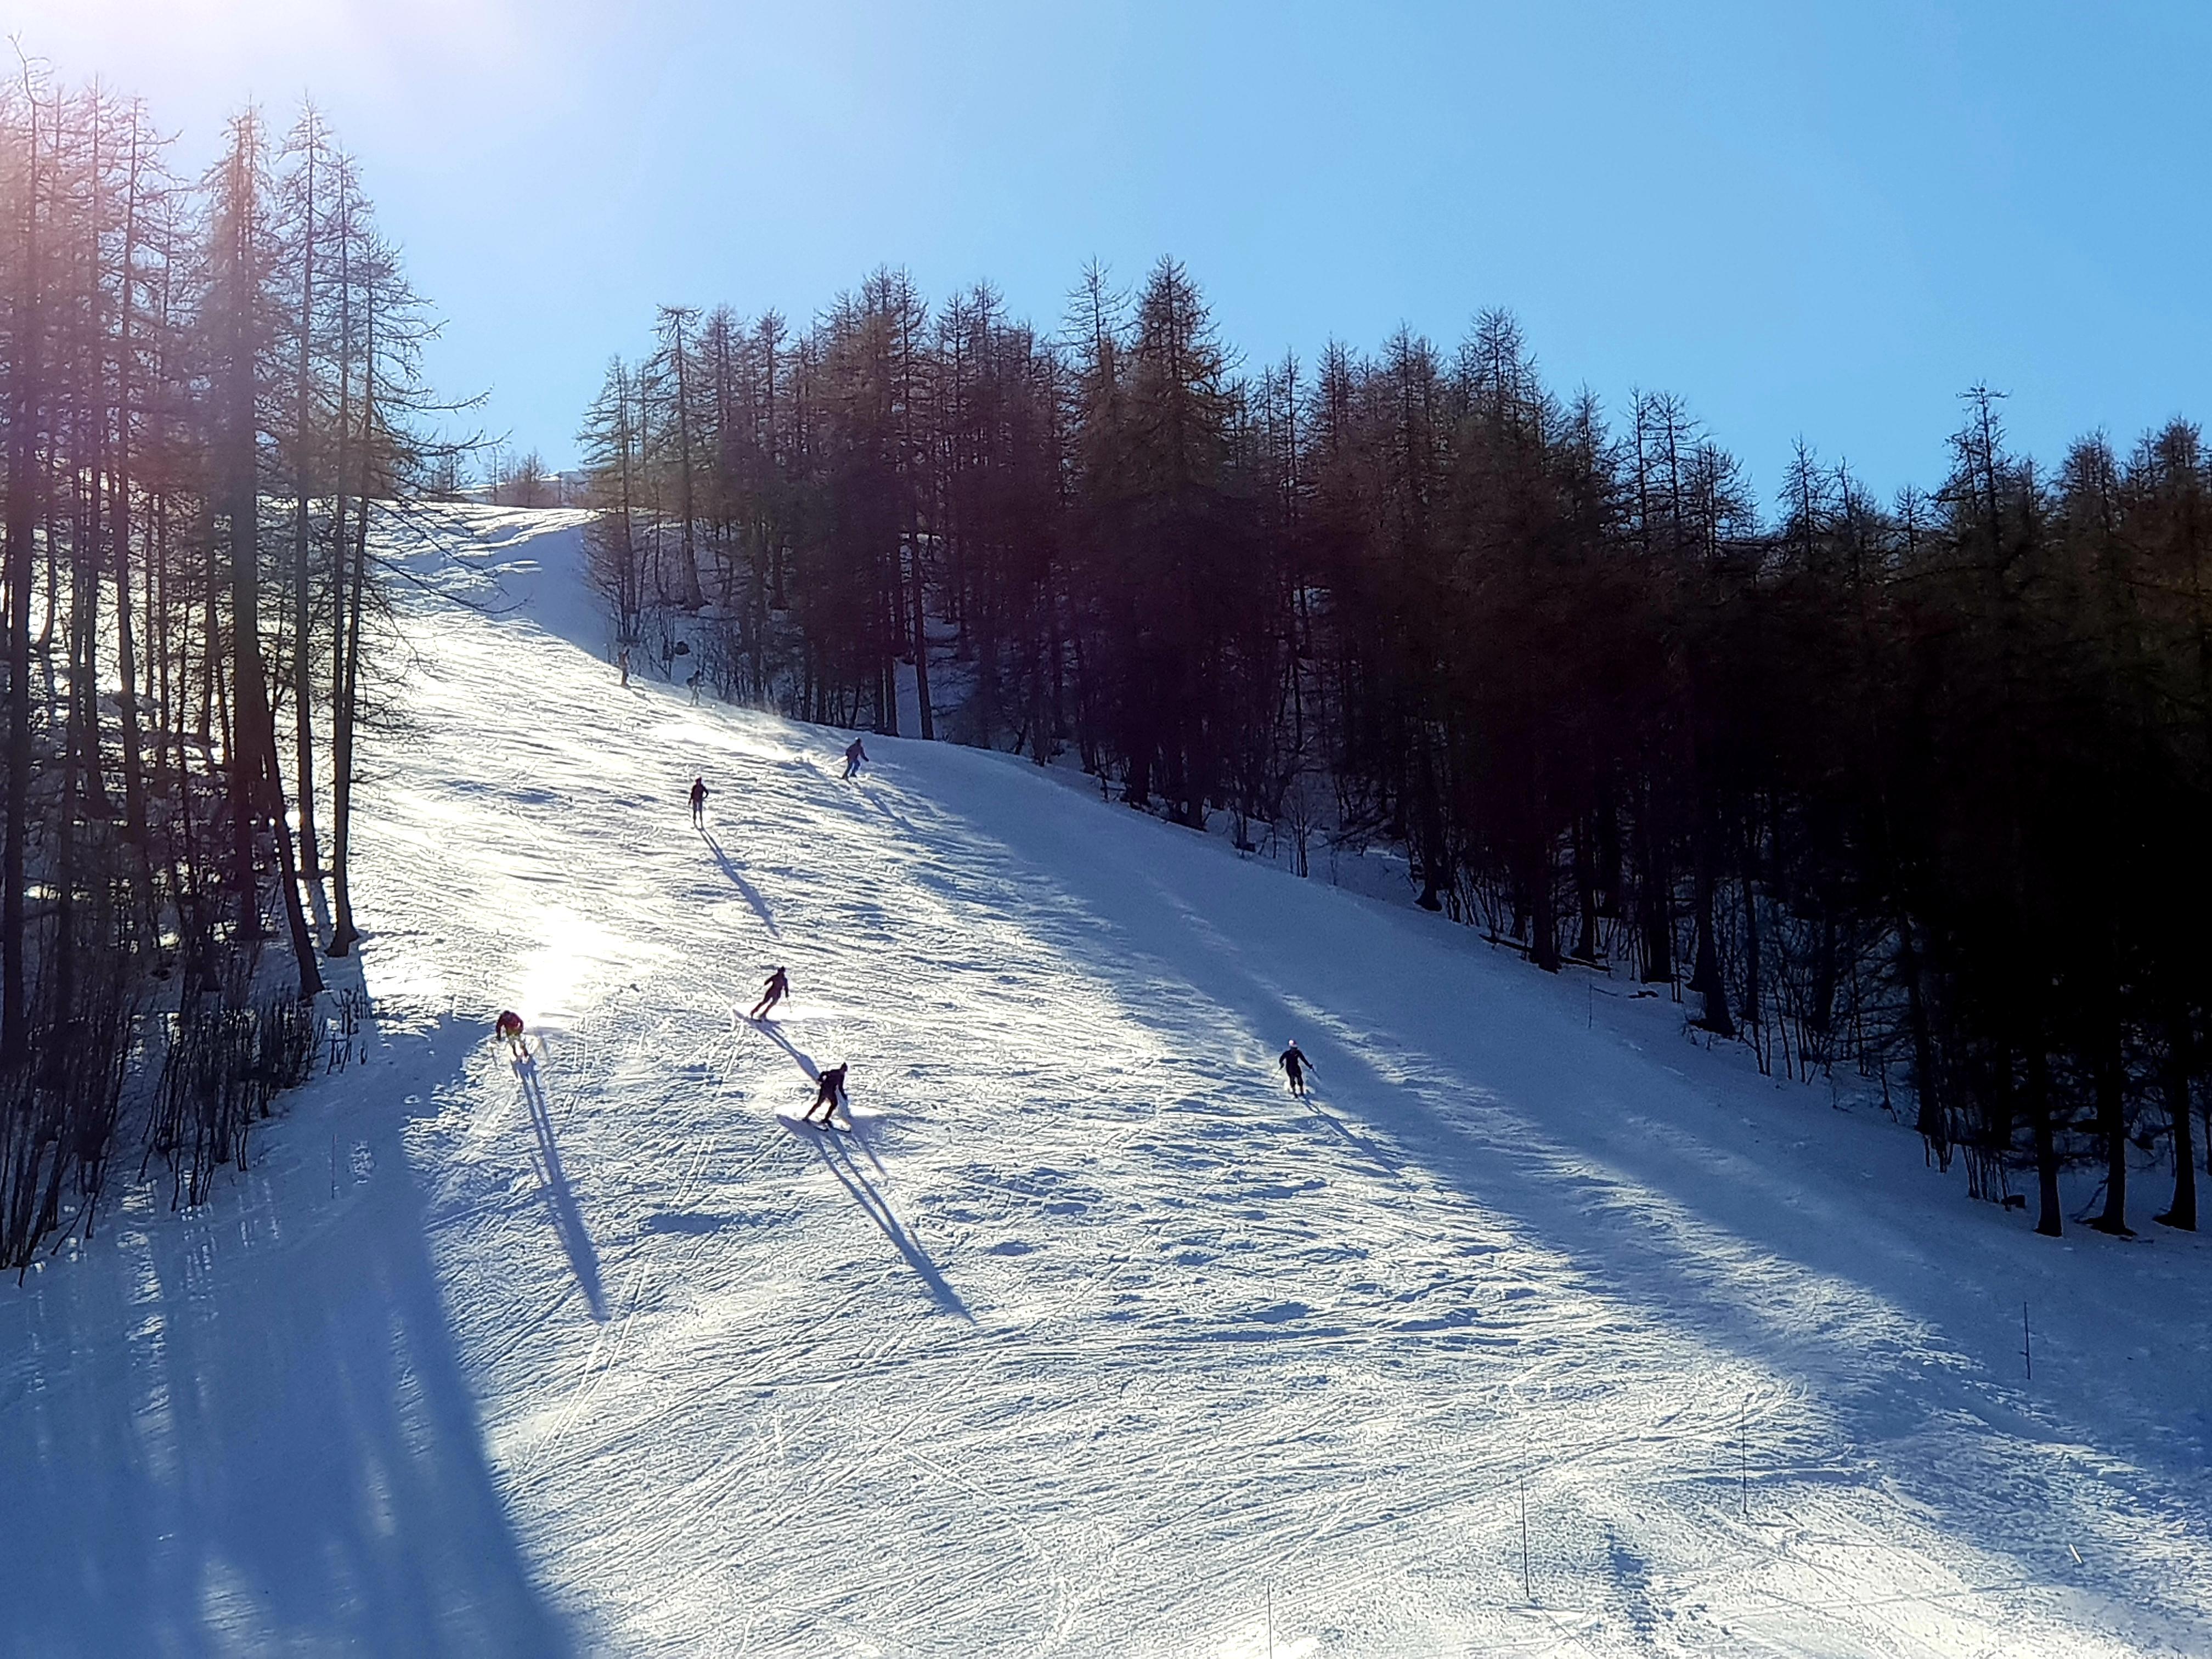 Val d'Allos Le Seignus, Val d'Allos 1500 Le Seignus